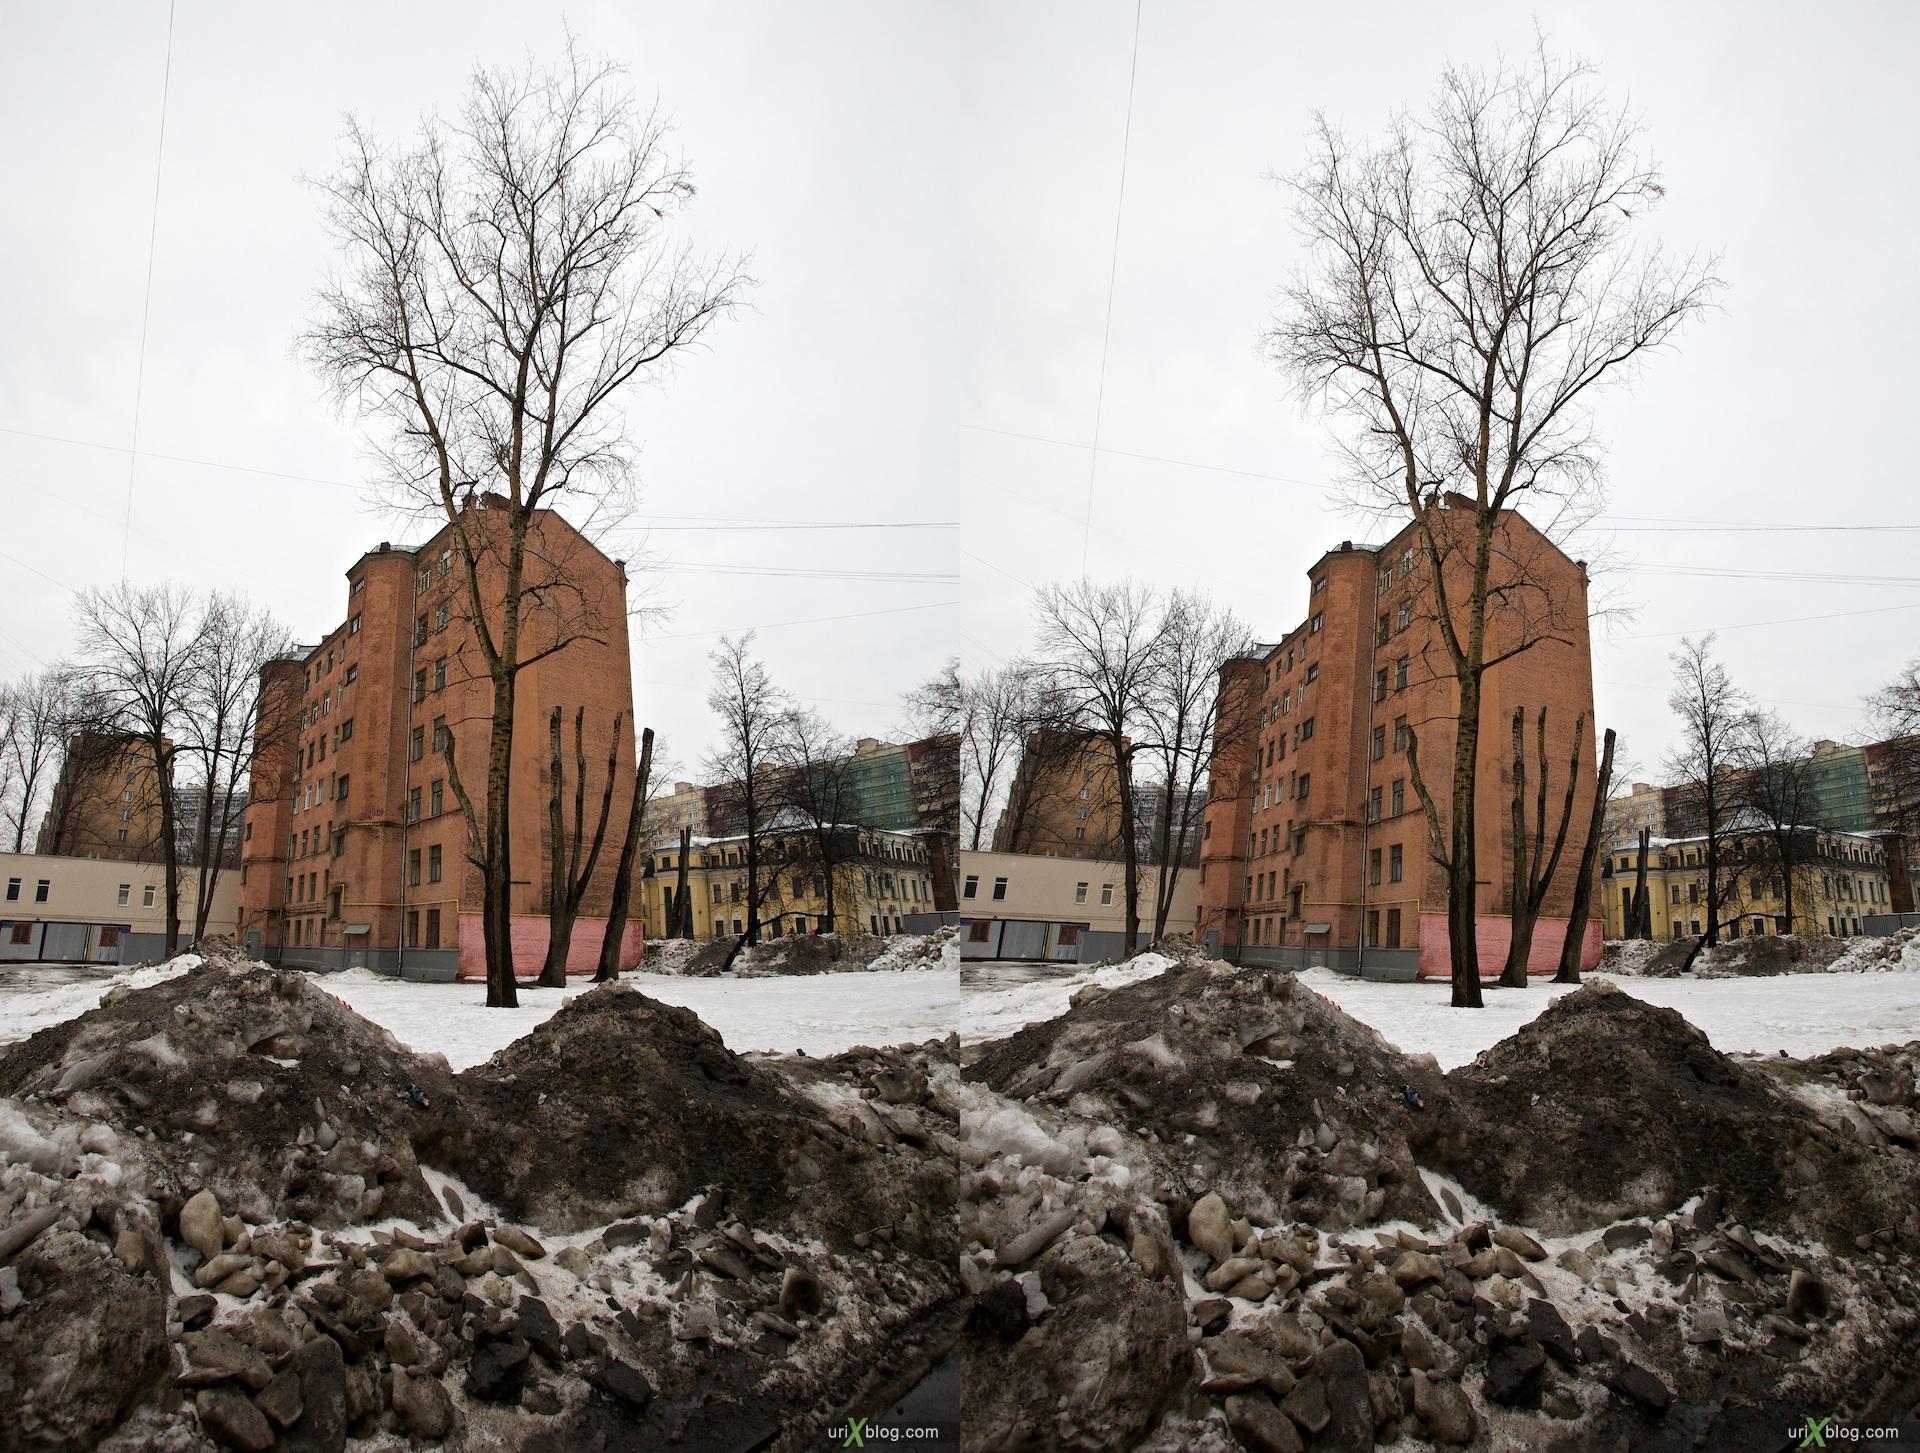 Moscow, near the Kurskaya metro station, 2010 3D, stereo, cross-eyed, стерео, стереопара, Москва, около Курской